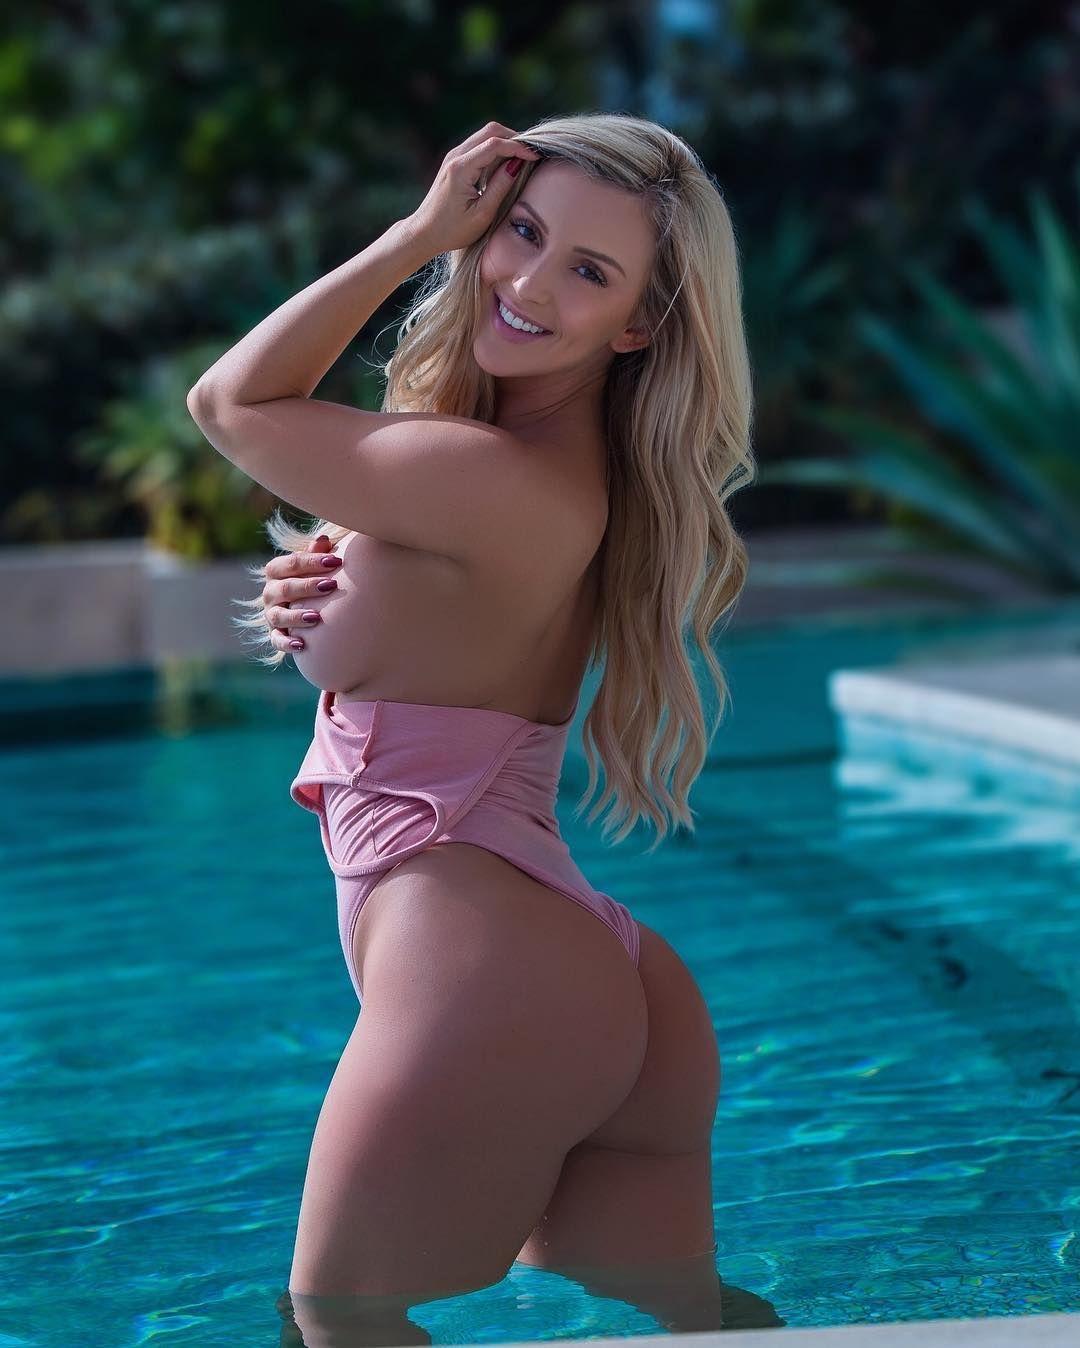 Feet Annalynne Mccord nudes (83 photo), Sexy, Is a cute, Twitter, butt 2015